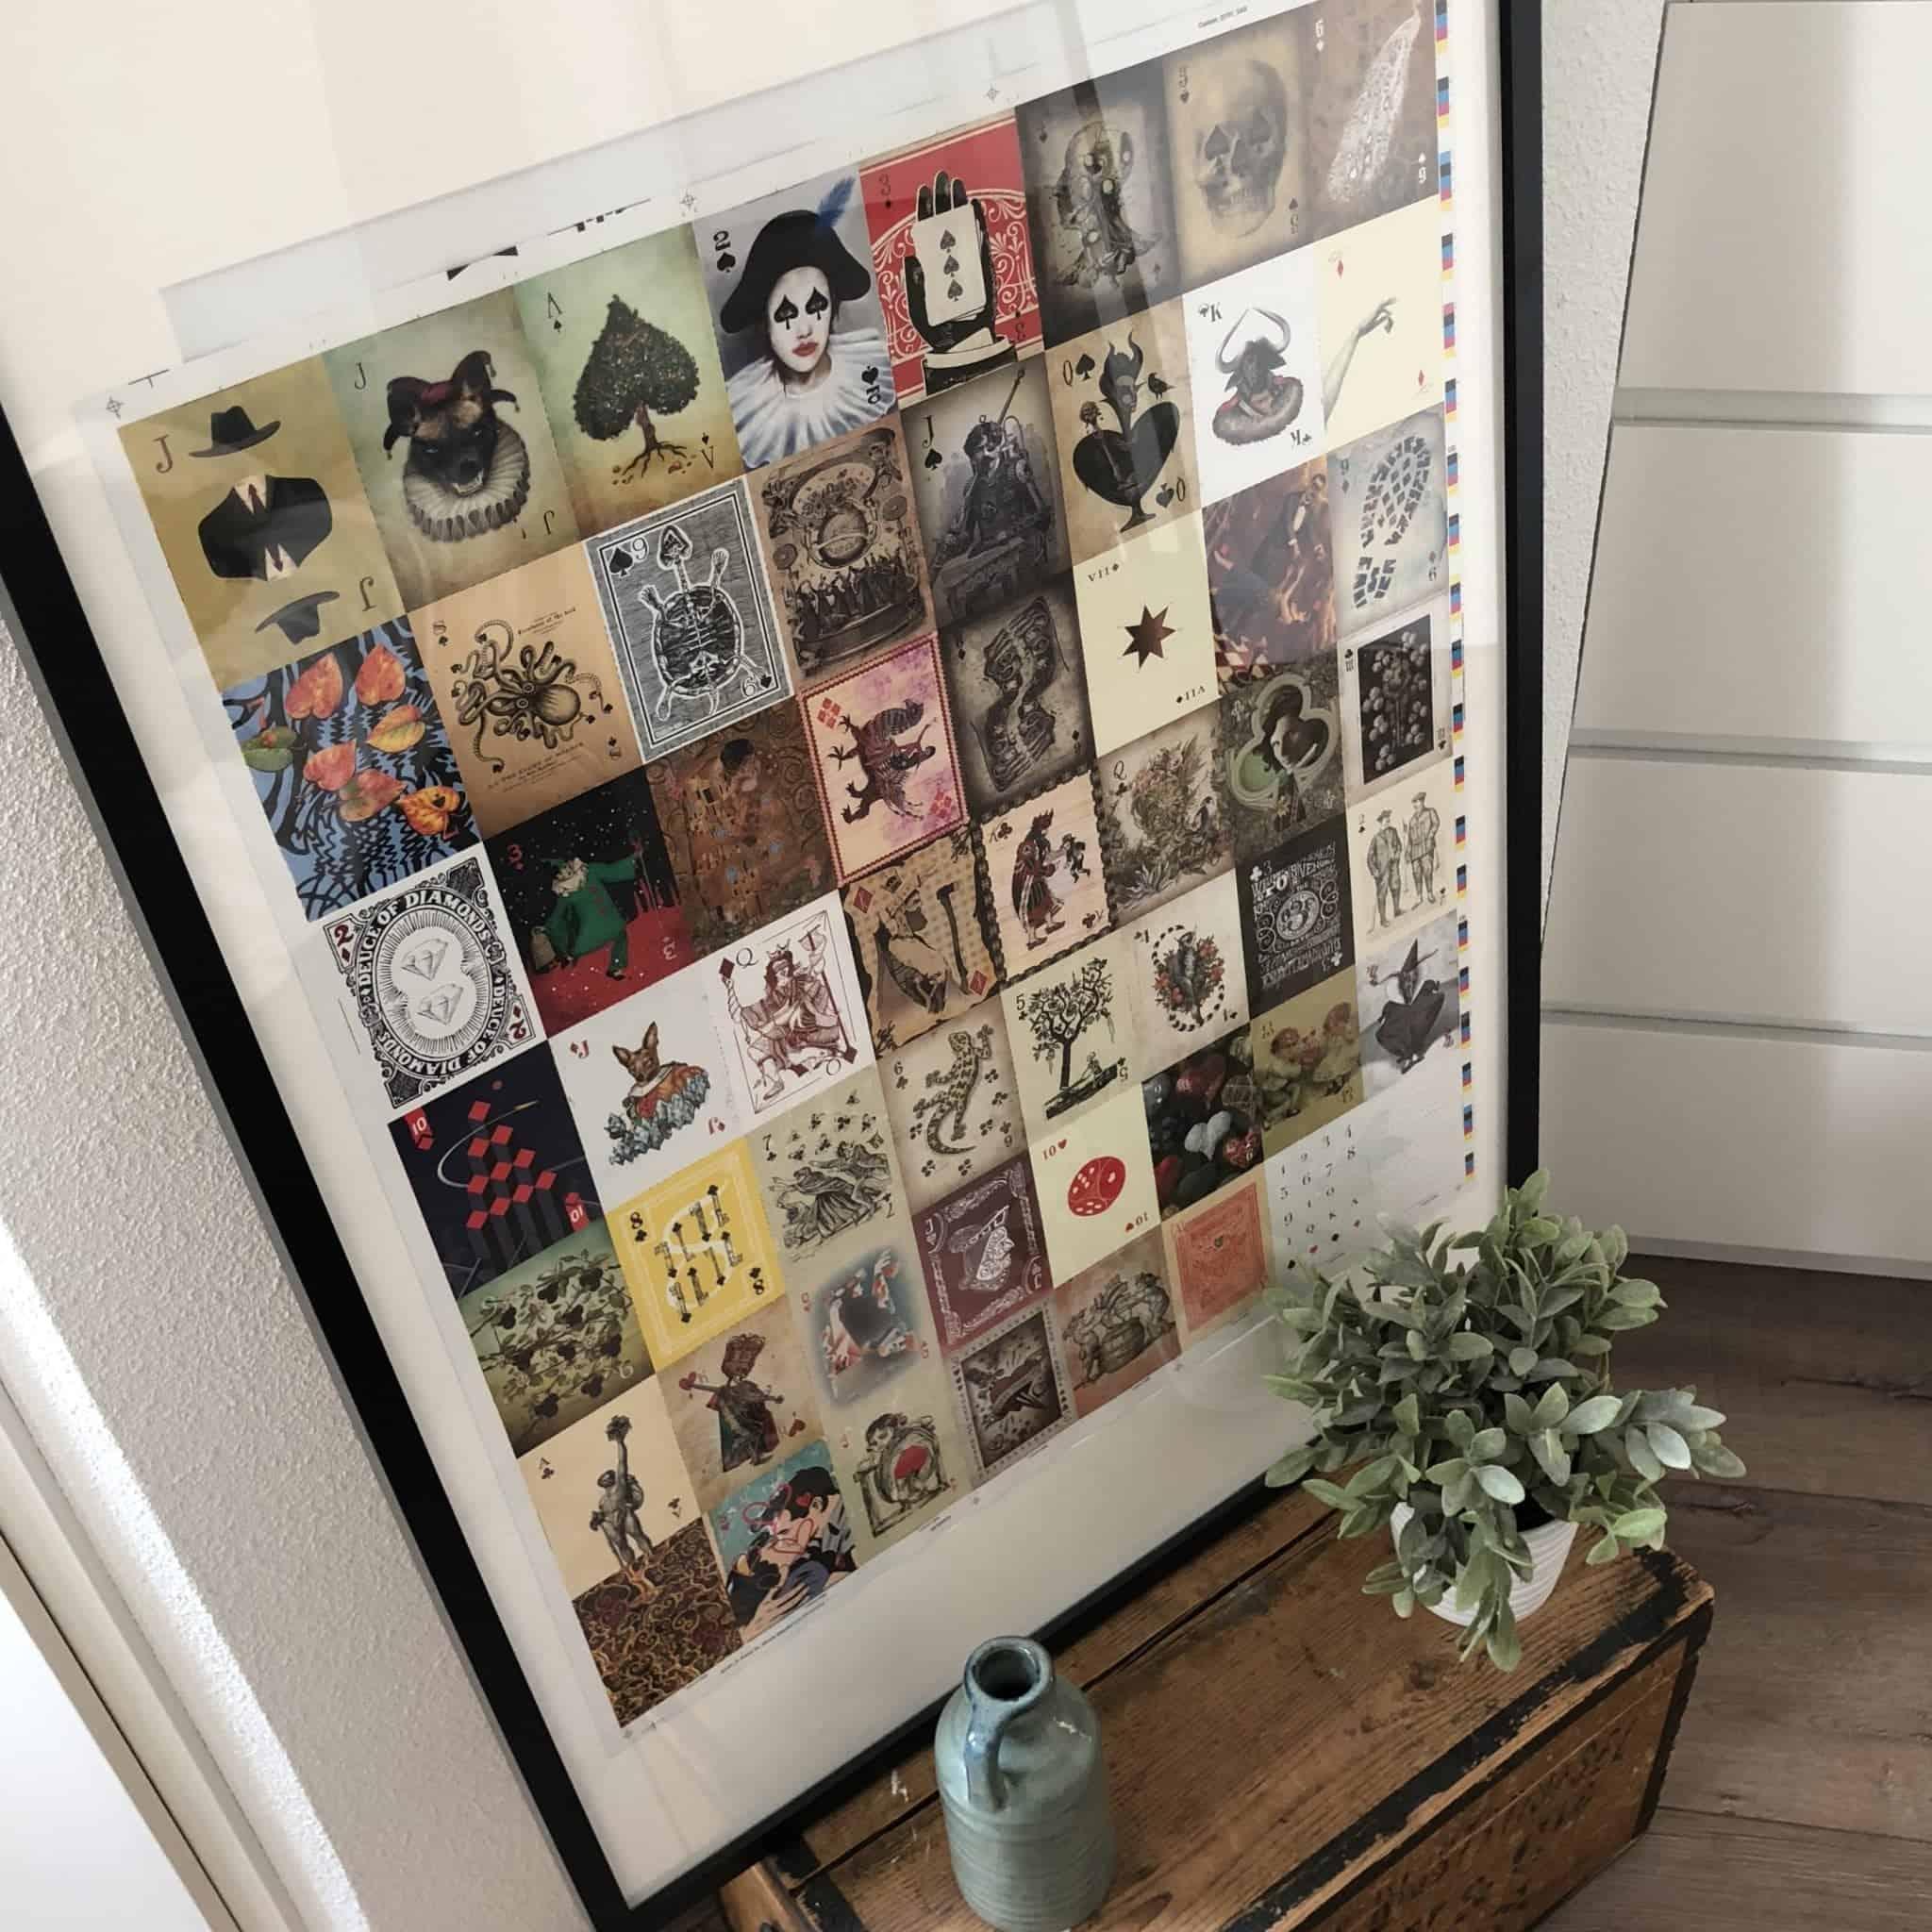 Few pics of my display/collection @julianx0ox 656815C0-5DBF-4057-9156-FF5BC1C17072CB27C1B8-2628-4FE6